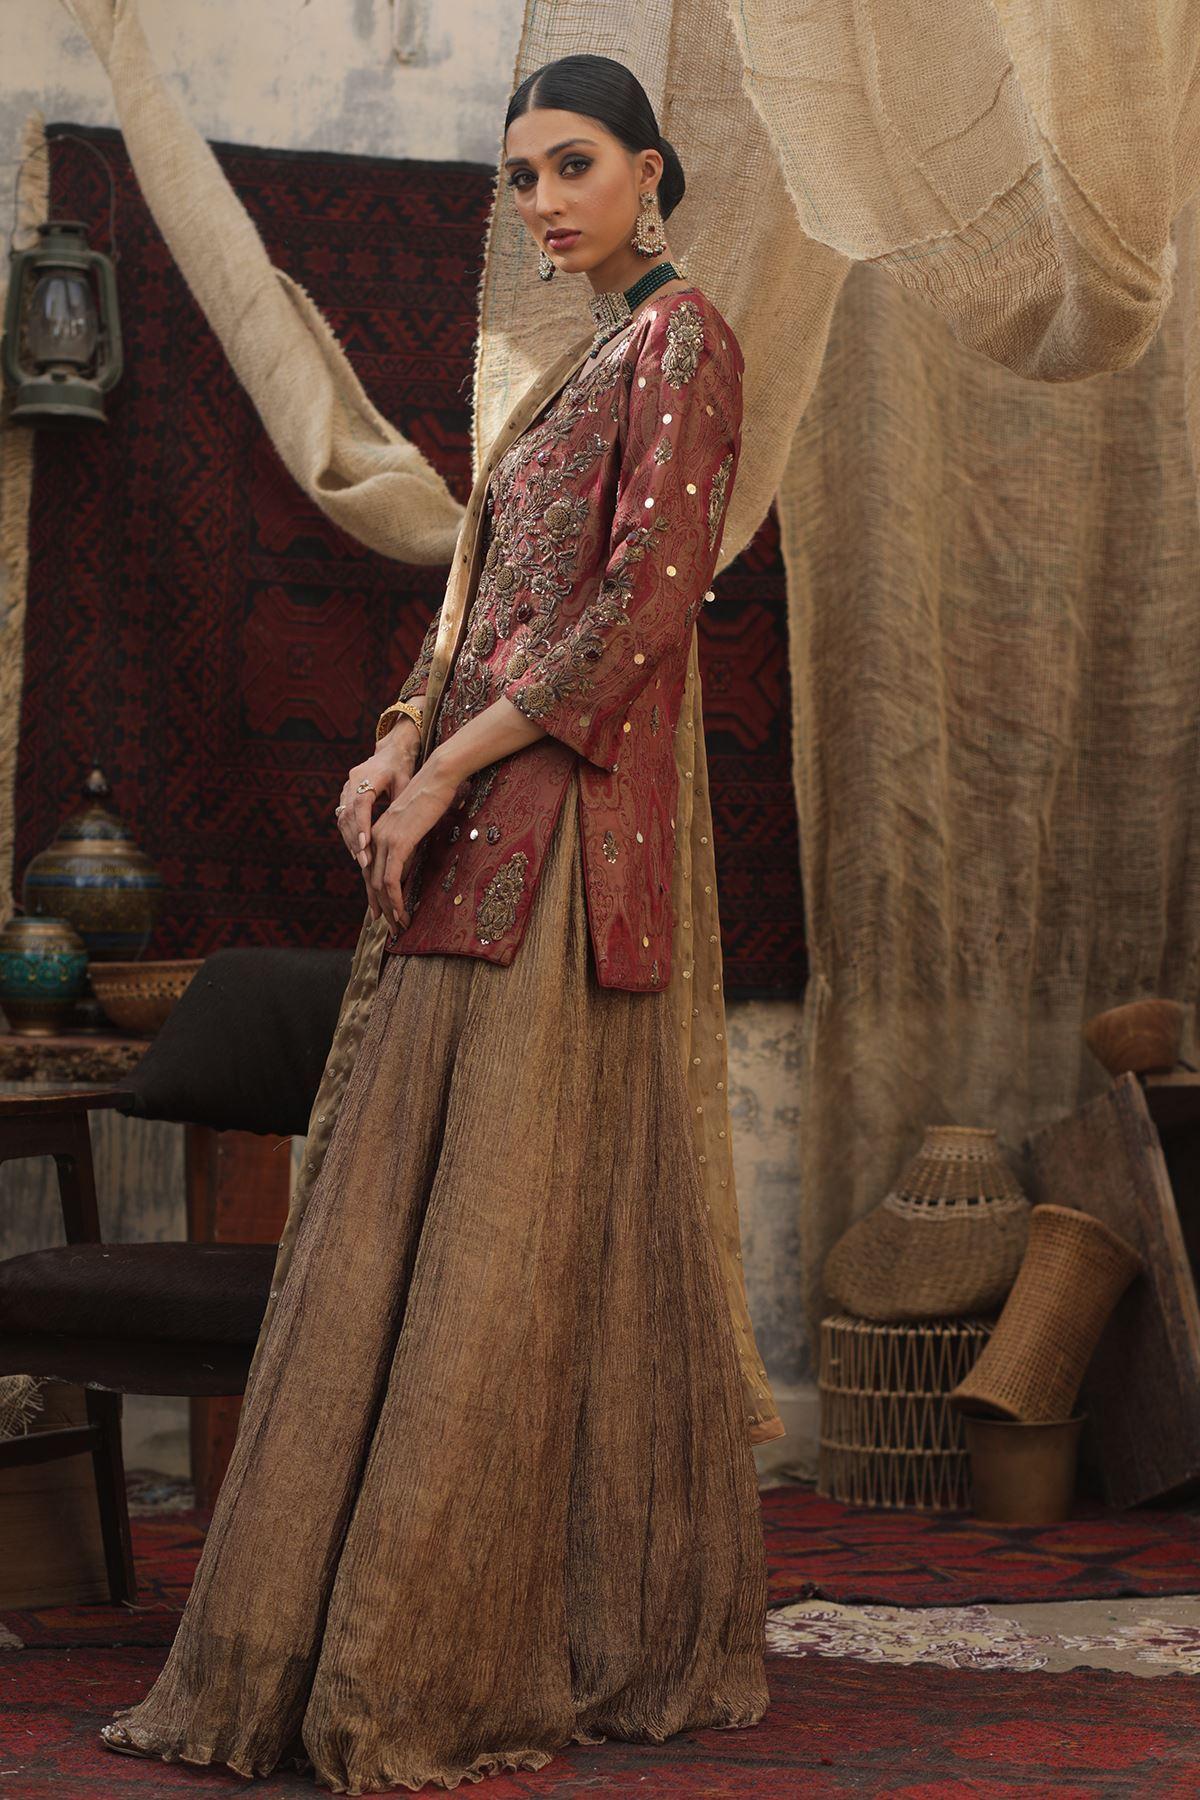 Moazzam Khan Party Wear 3PC Shirt Sharara Dupatta in Brown for Women